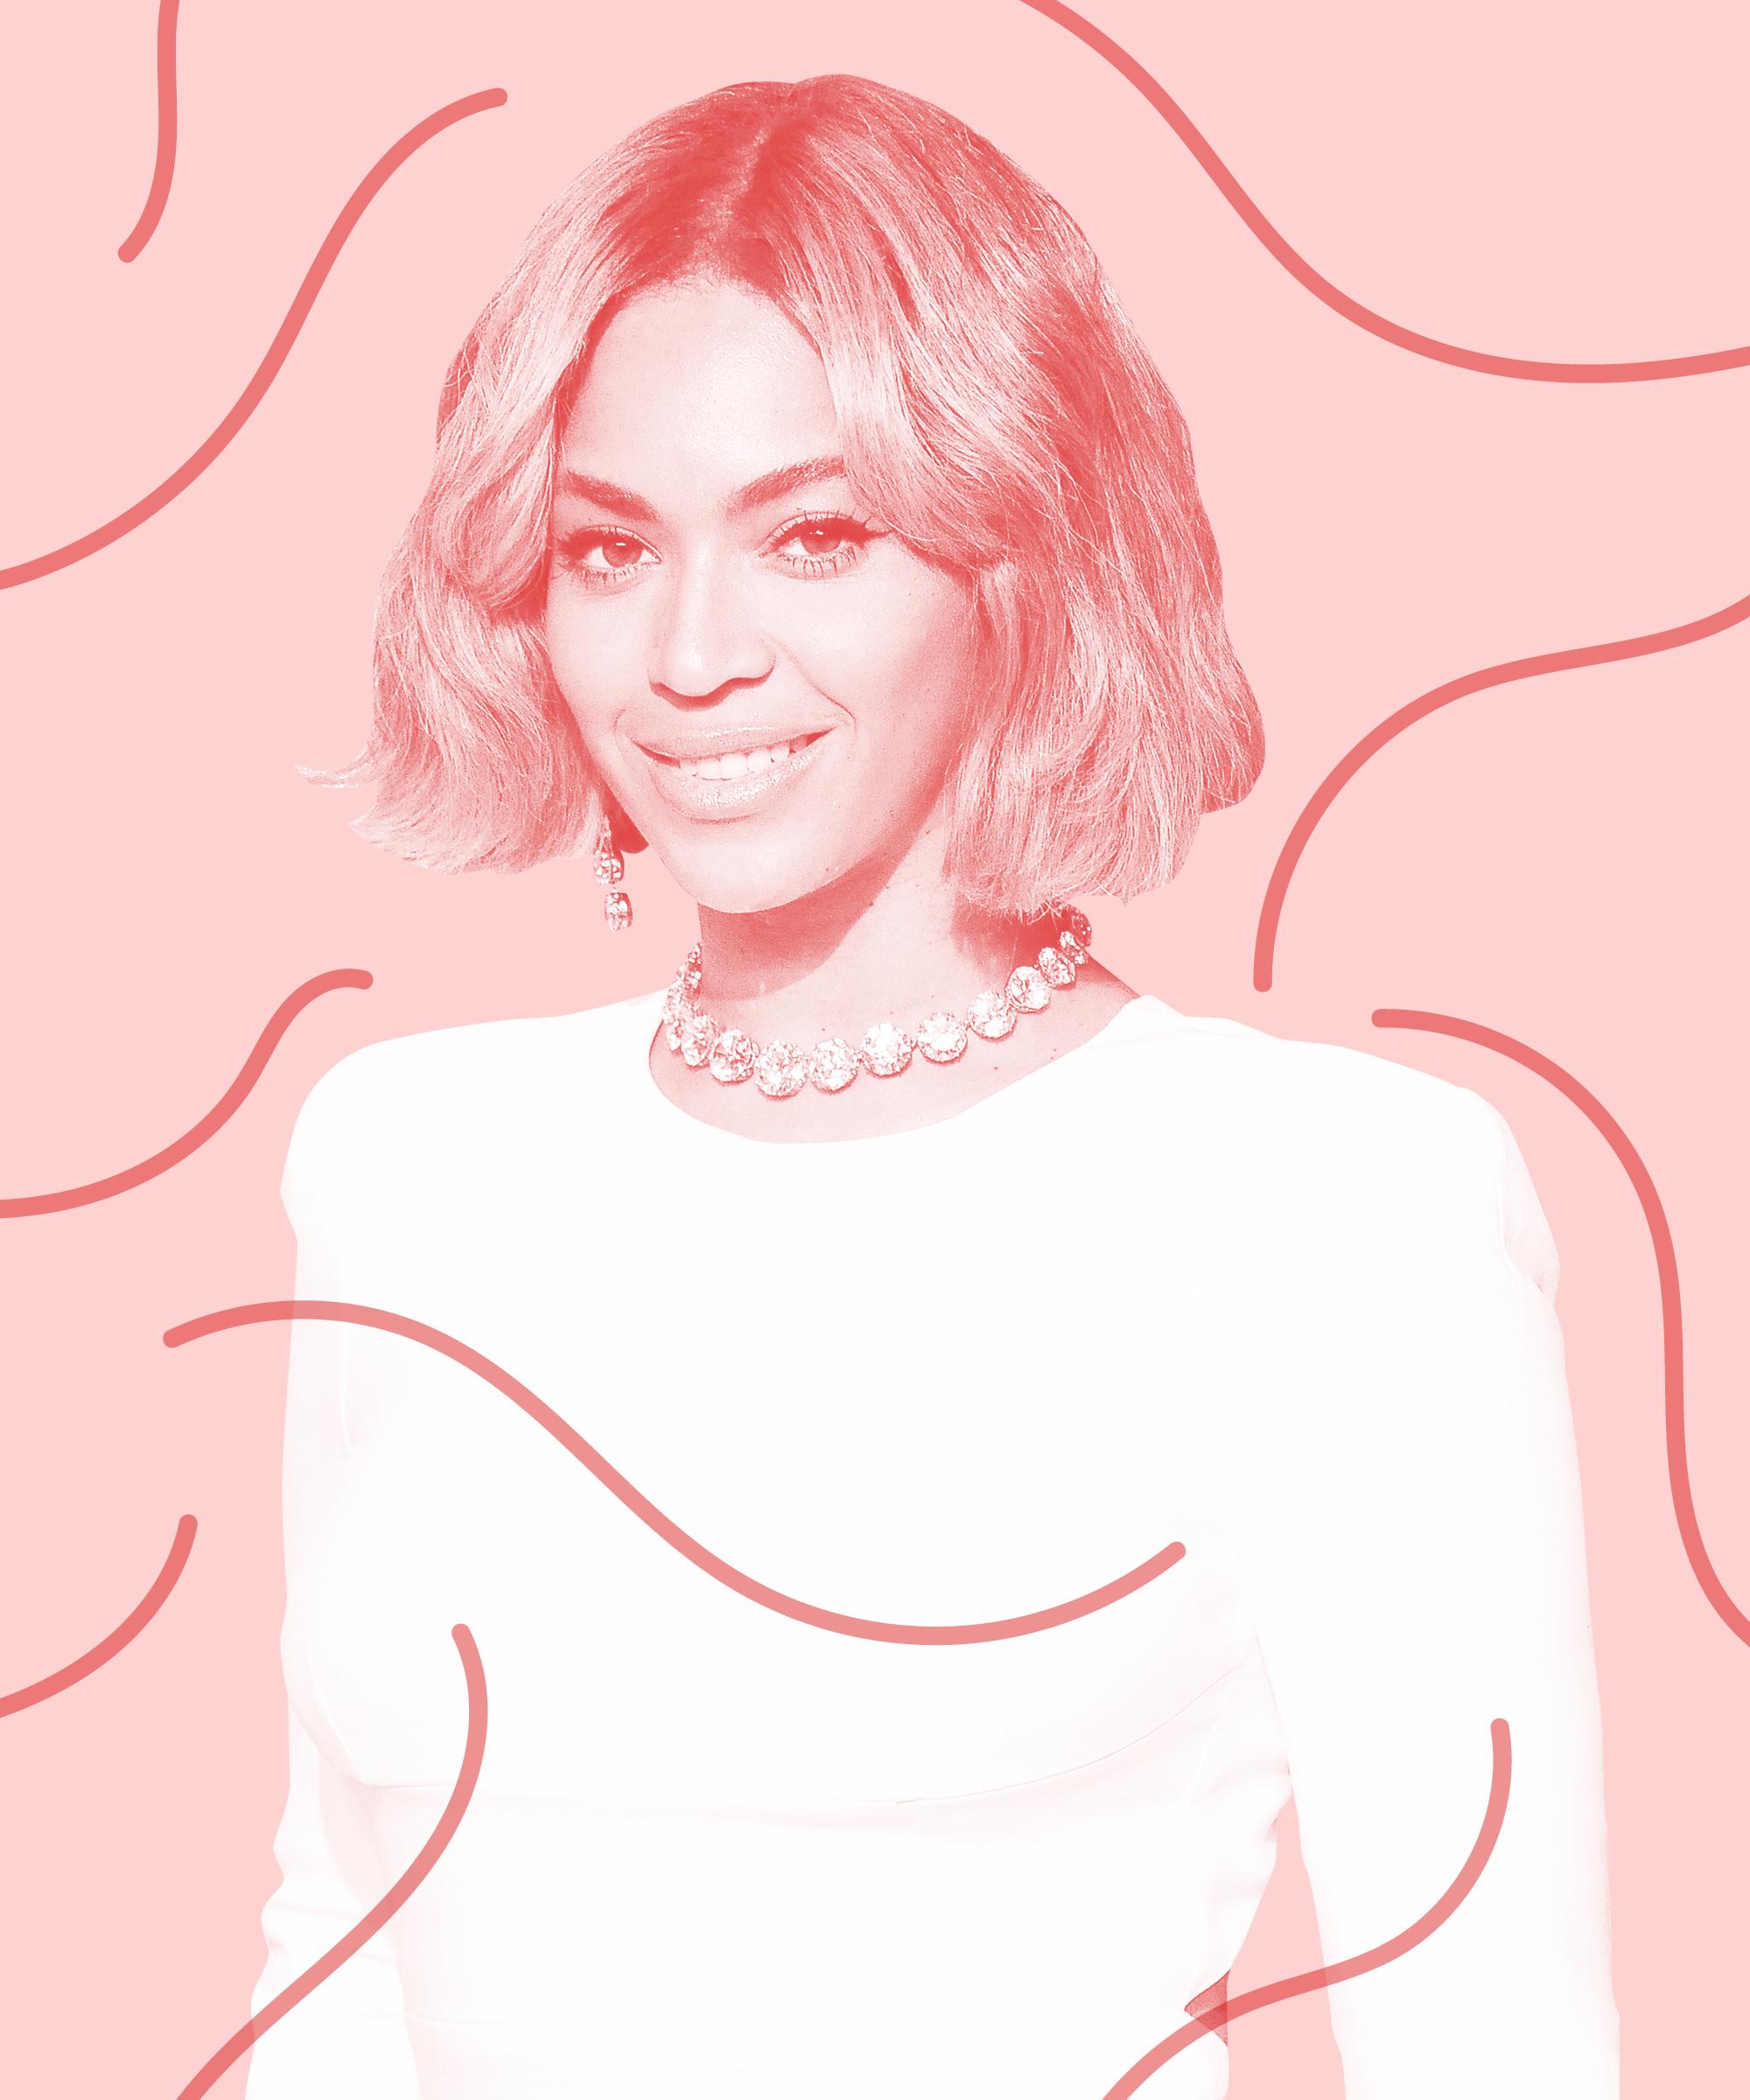 Famous Birthdays: celebrity bios and today's birthdays